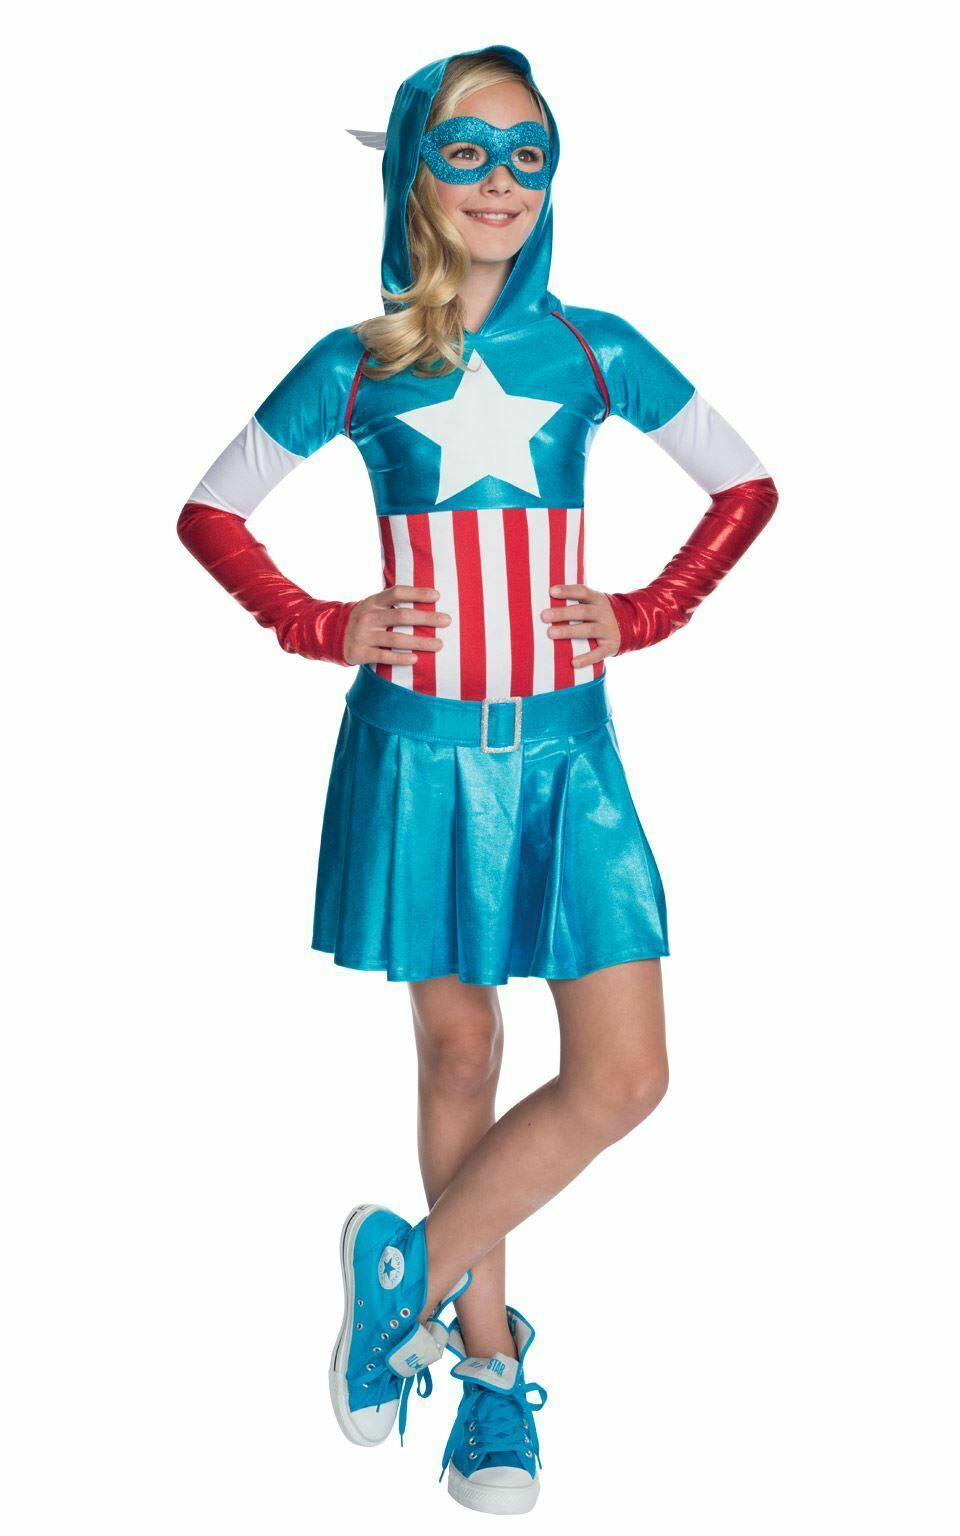 Ragazze Bambini Costume da Capitan America Marvel DC Comics Supereroe Costume Outfit